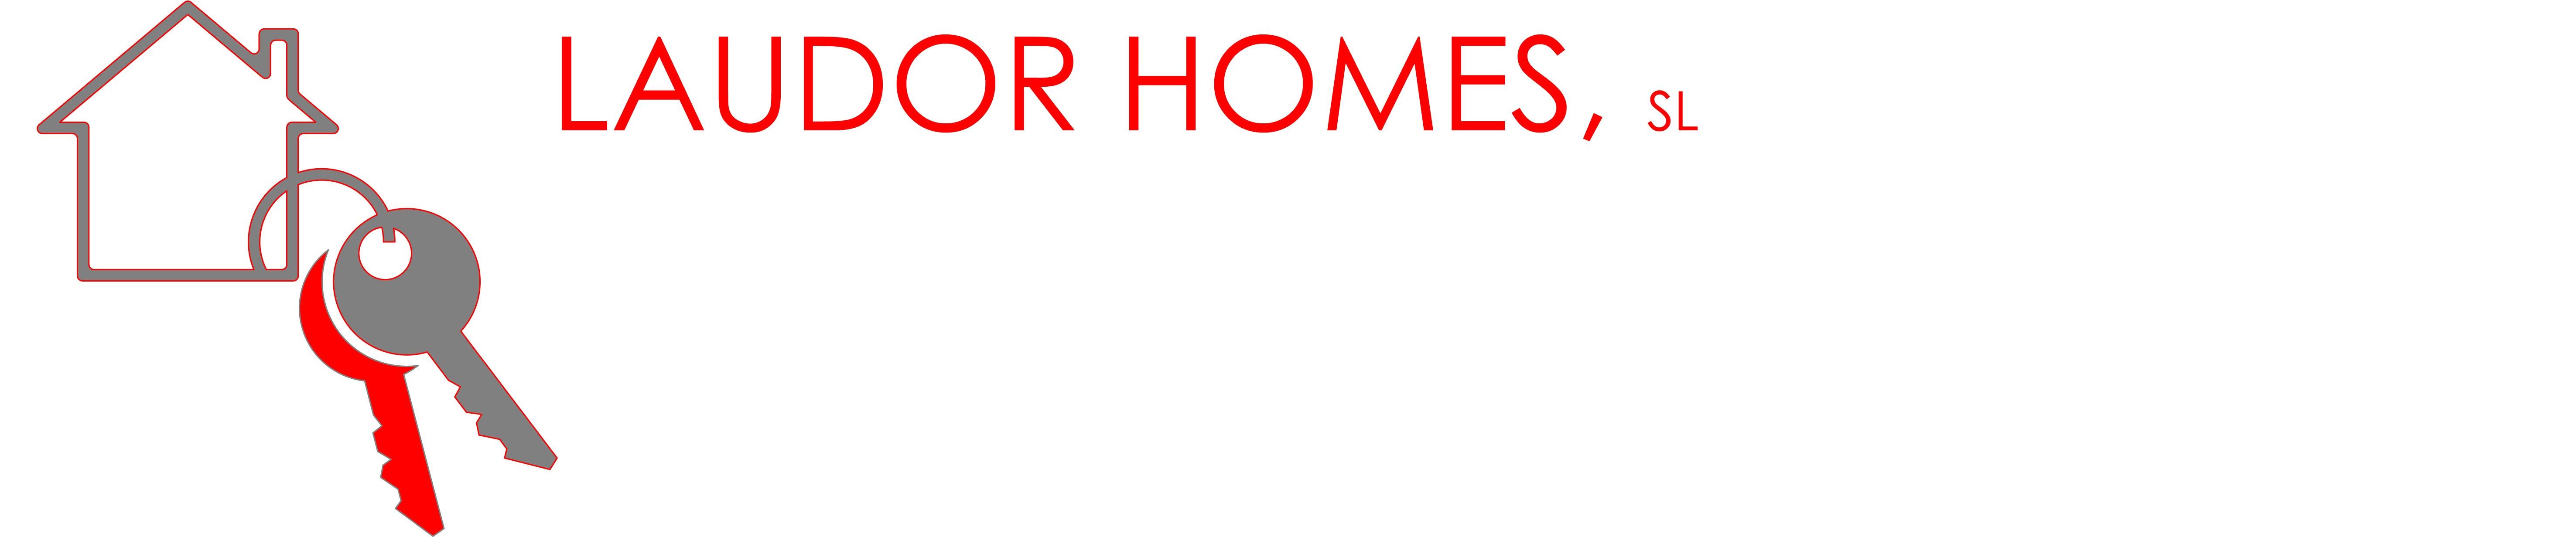 14. LAUDOR HOMES